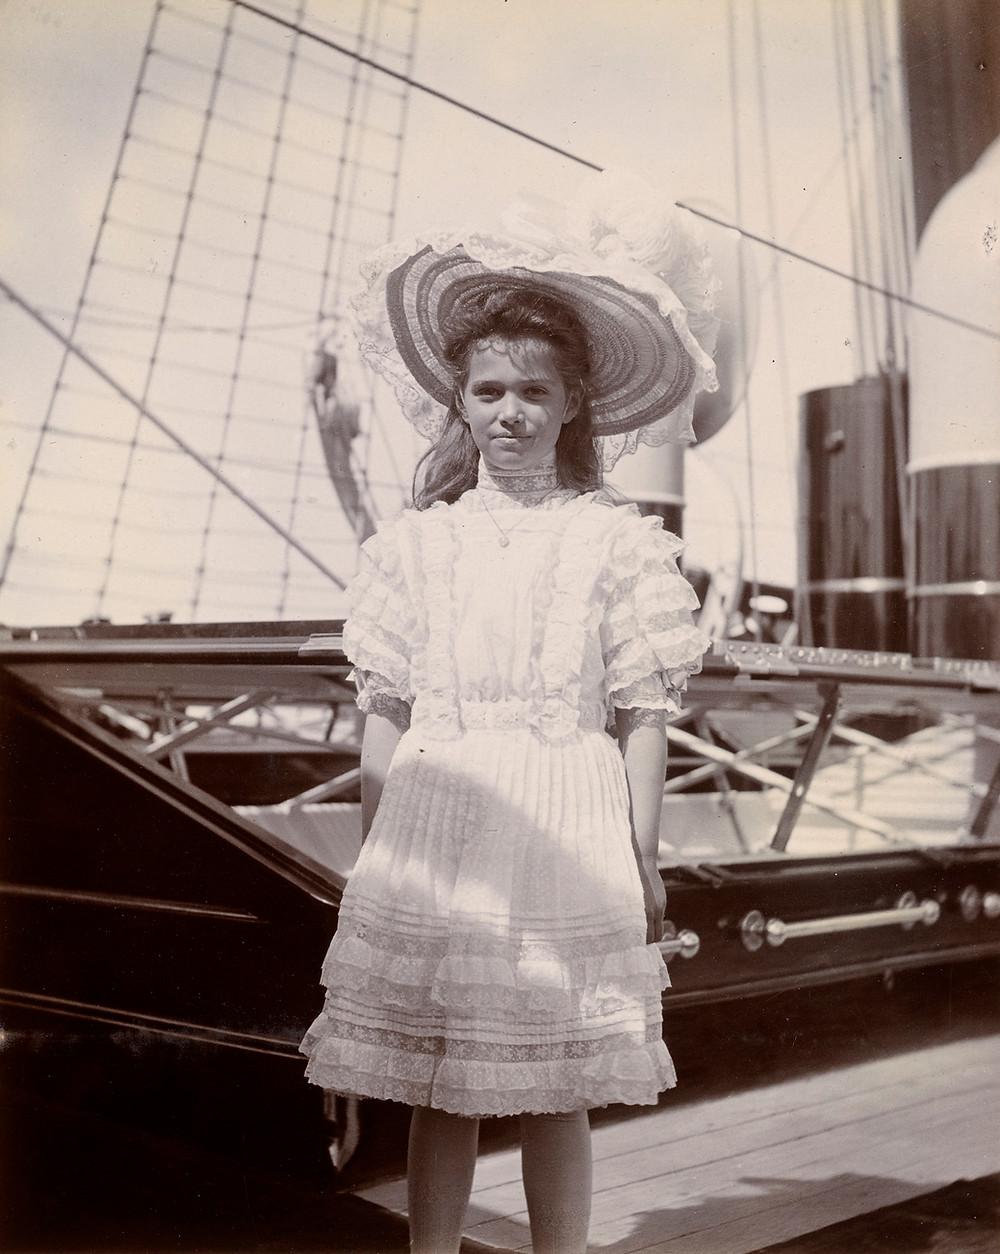 Grand Duchess Marie Nicholaievna (1899-1918), Jun 1908. Royal Collection Trust/© Her Majesty Queen Elizabeth II 2019